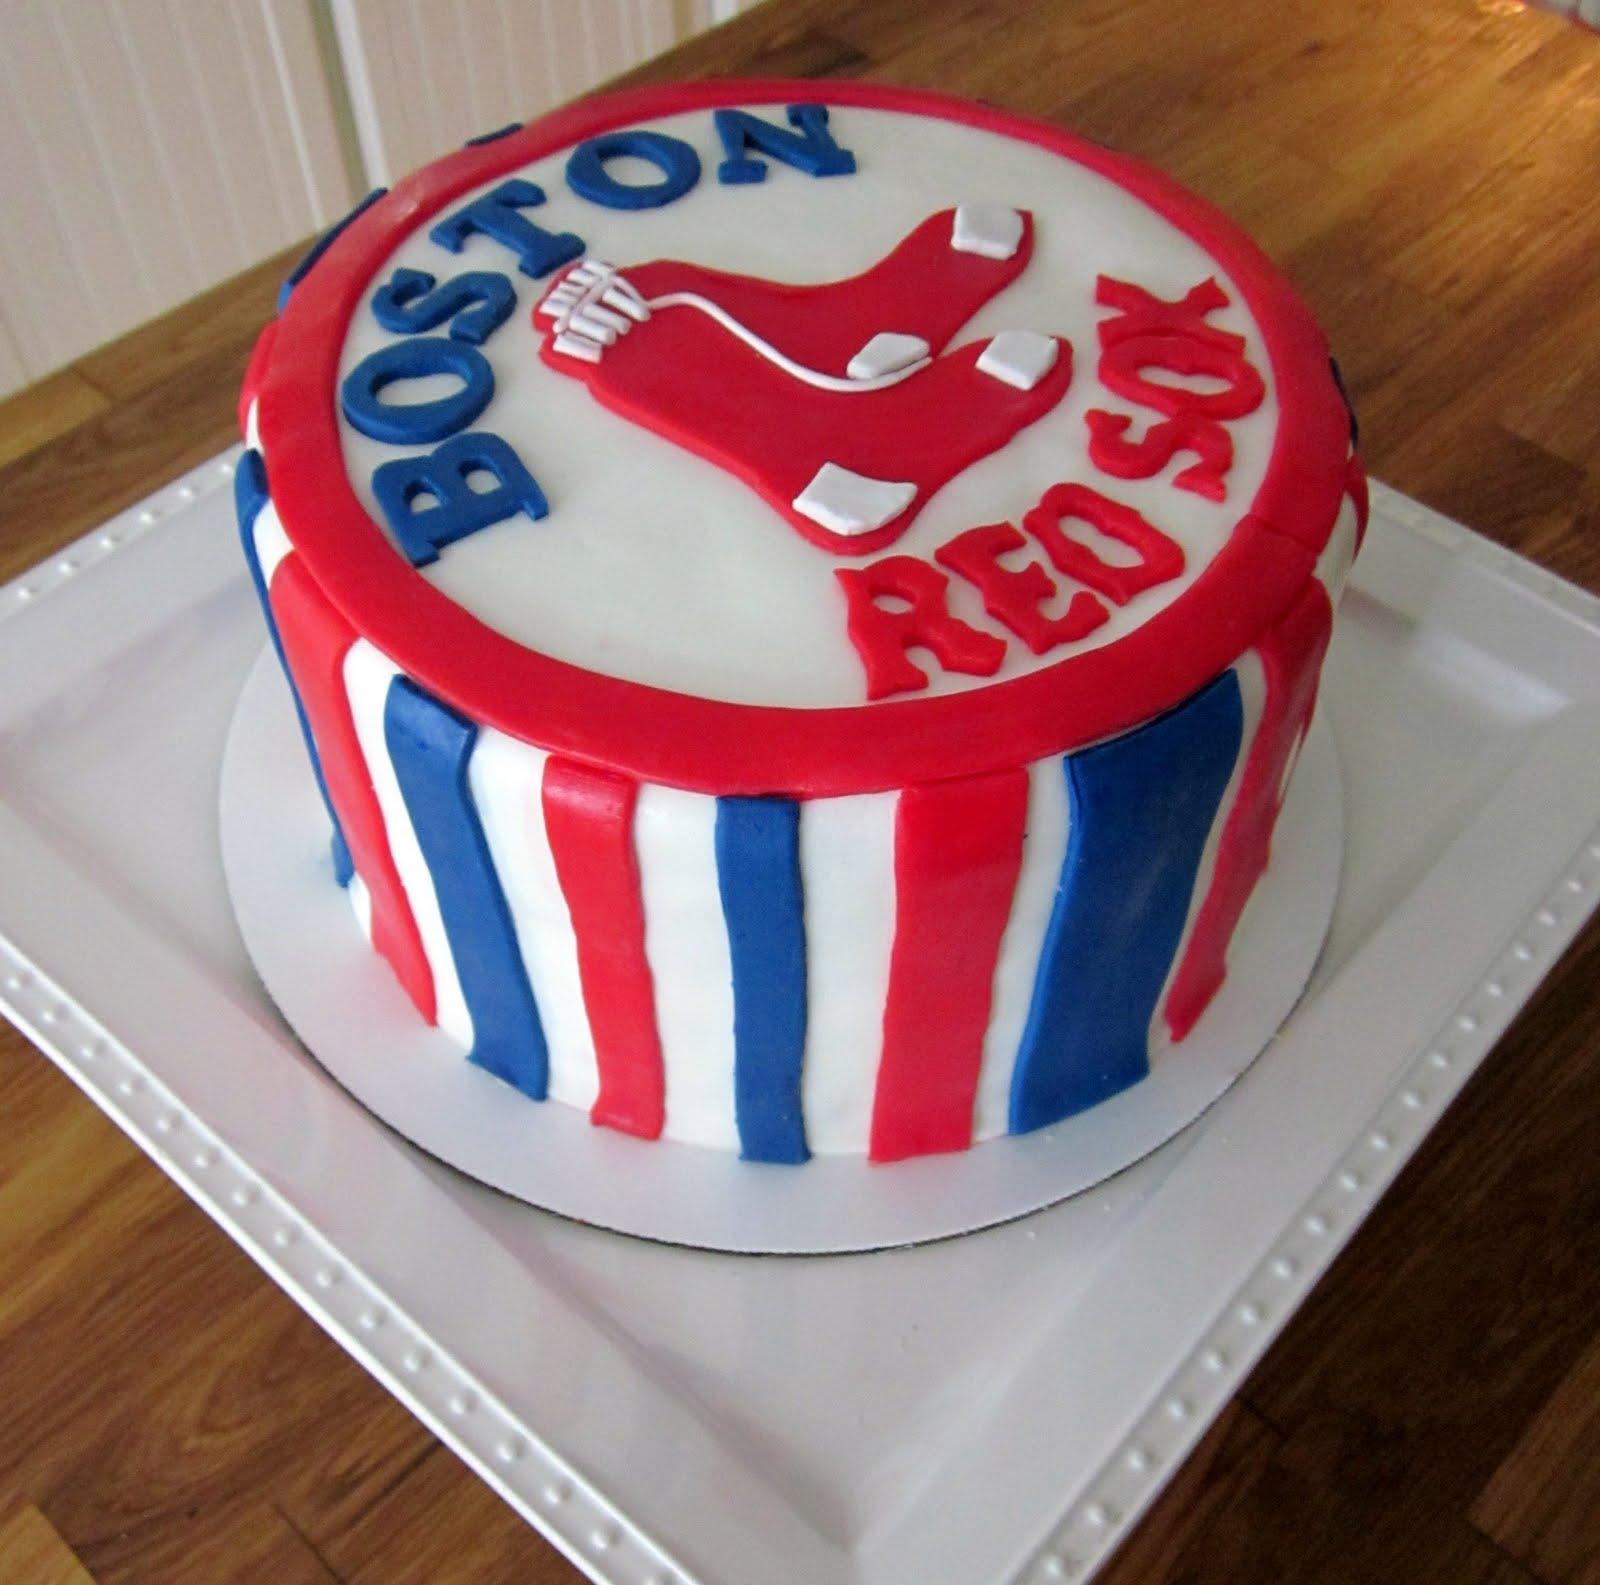 Darlin Designs Boston Red Sox Cake